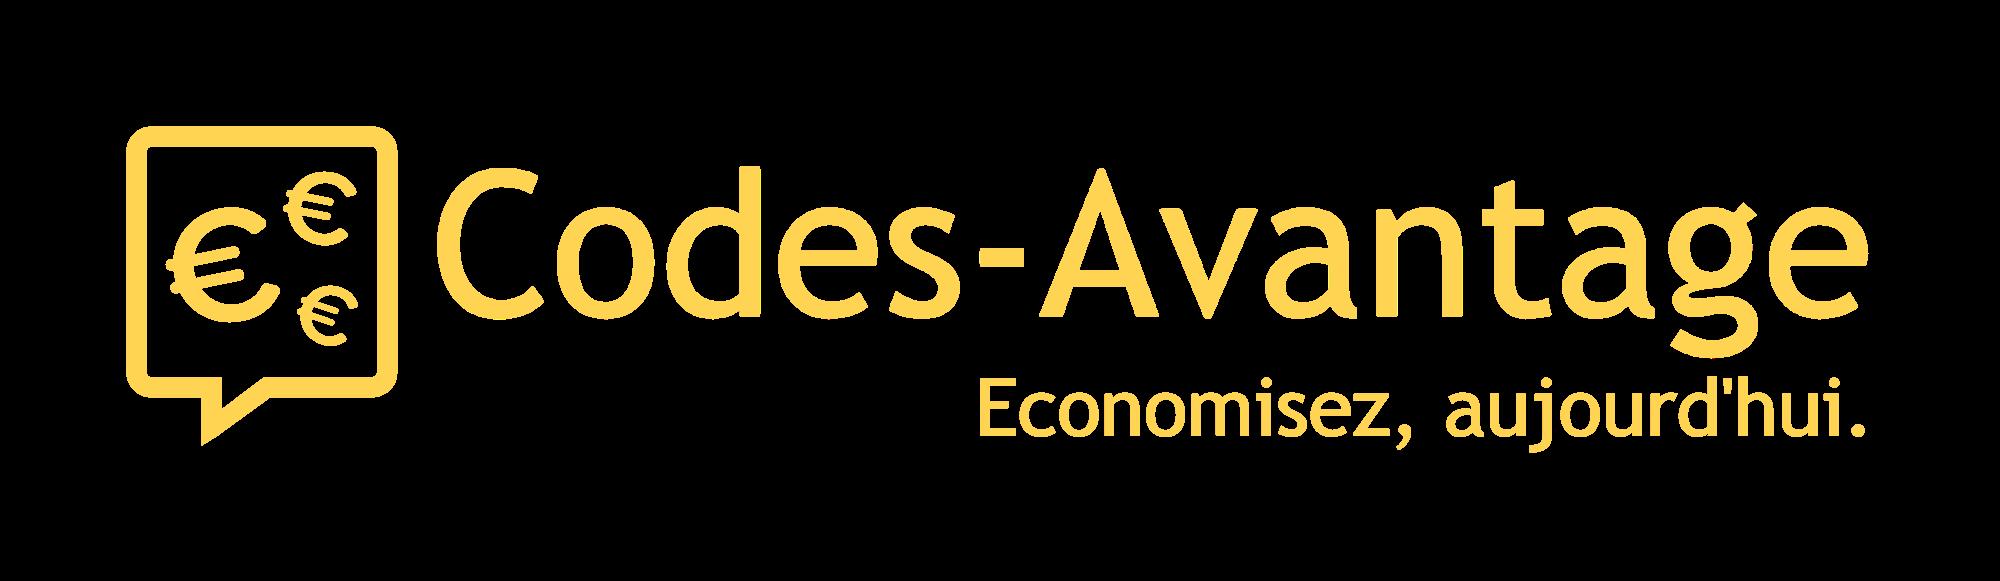 code avantage logo